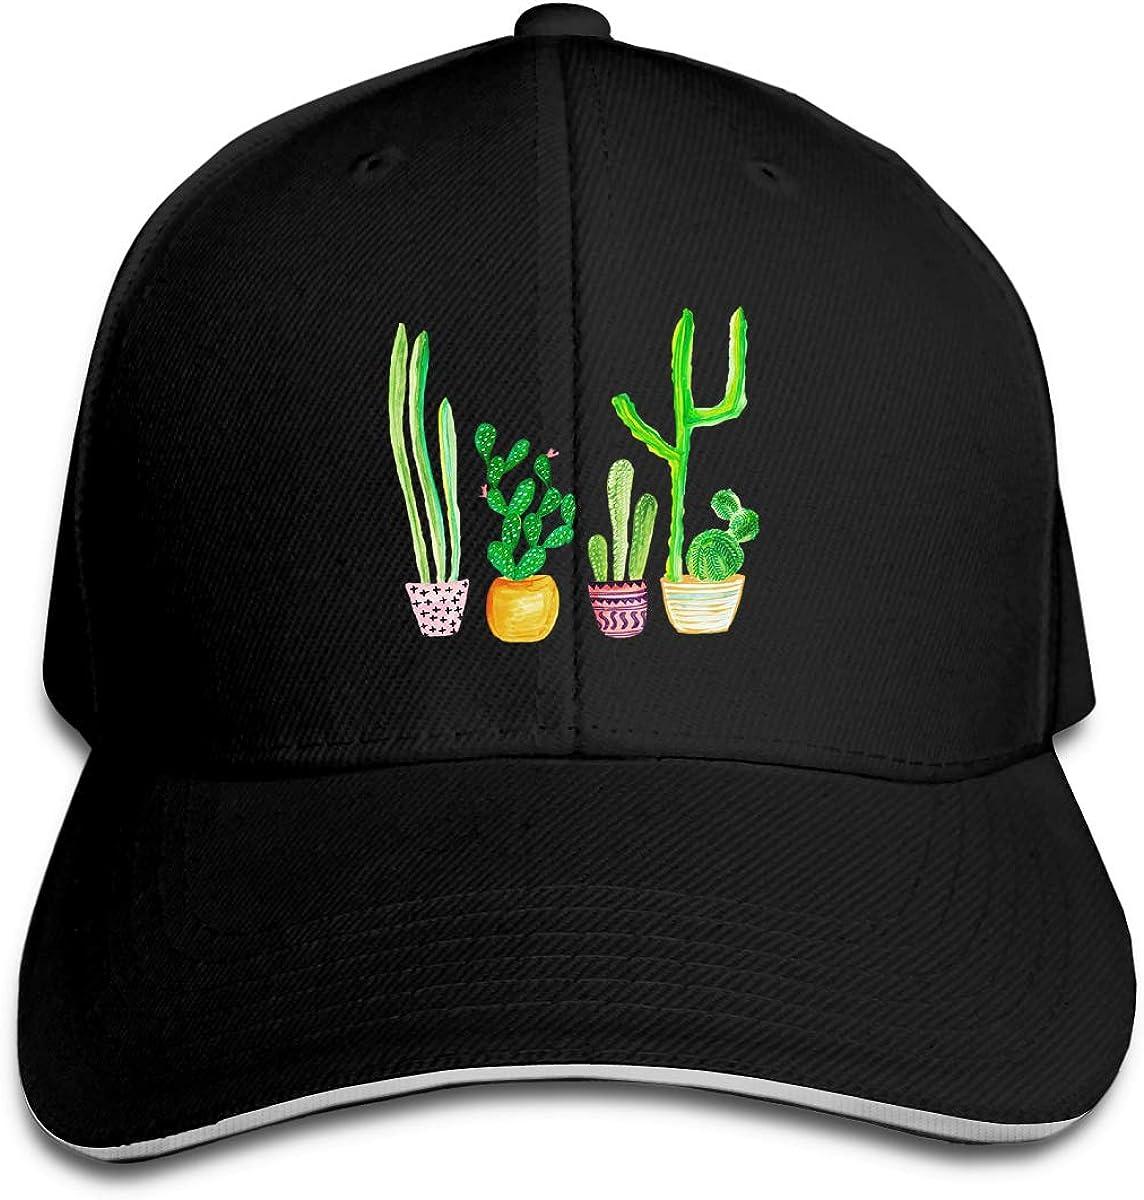 Cacti Cactus Love Article Classic Adjustable Cotton Baseball Caps Trucker Driver Hat Outdoor Cap Black